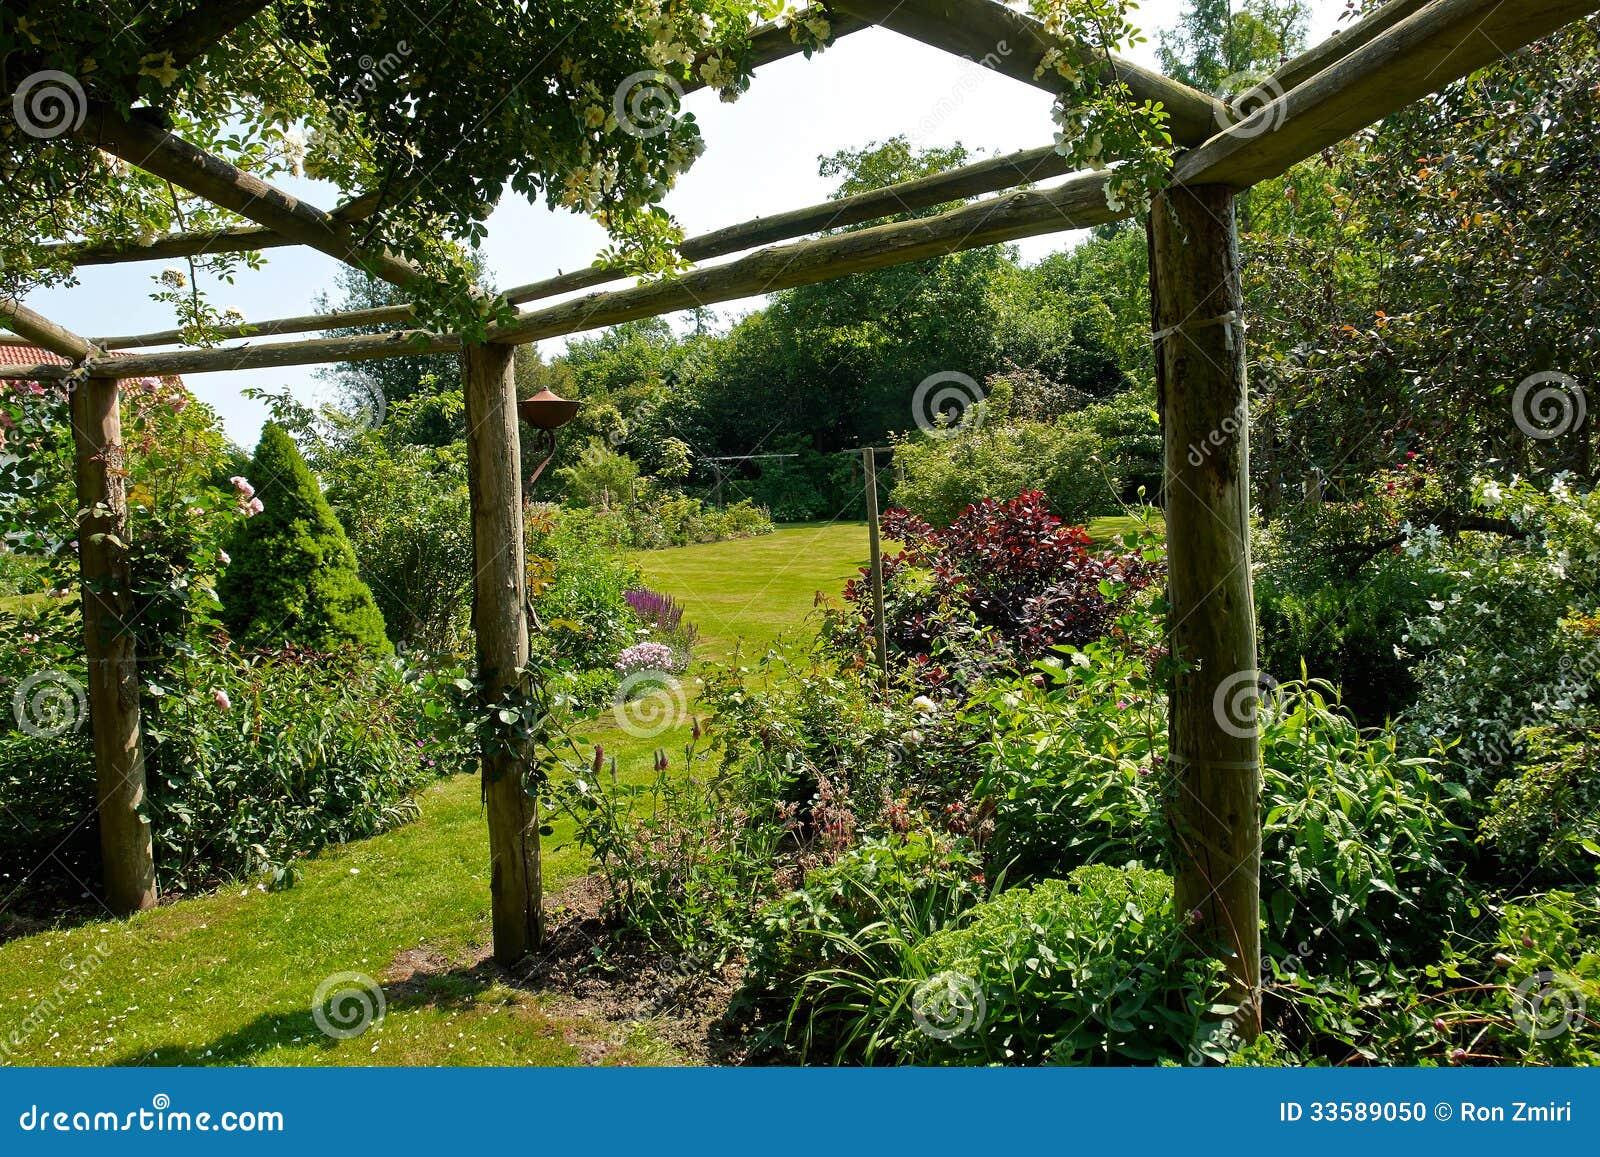 Pergola gazebo in a beautiful garden stock photo image of arbour outdoors 33589050 - Gazebo pergola designs dream spot ...